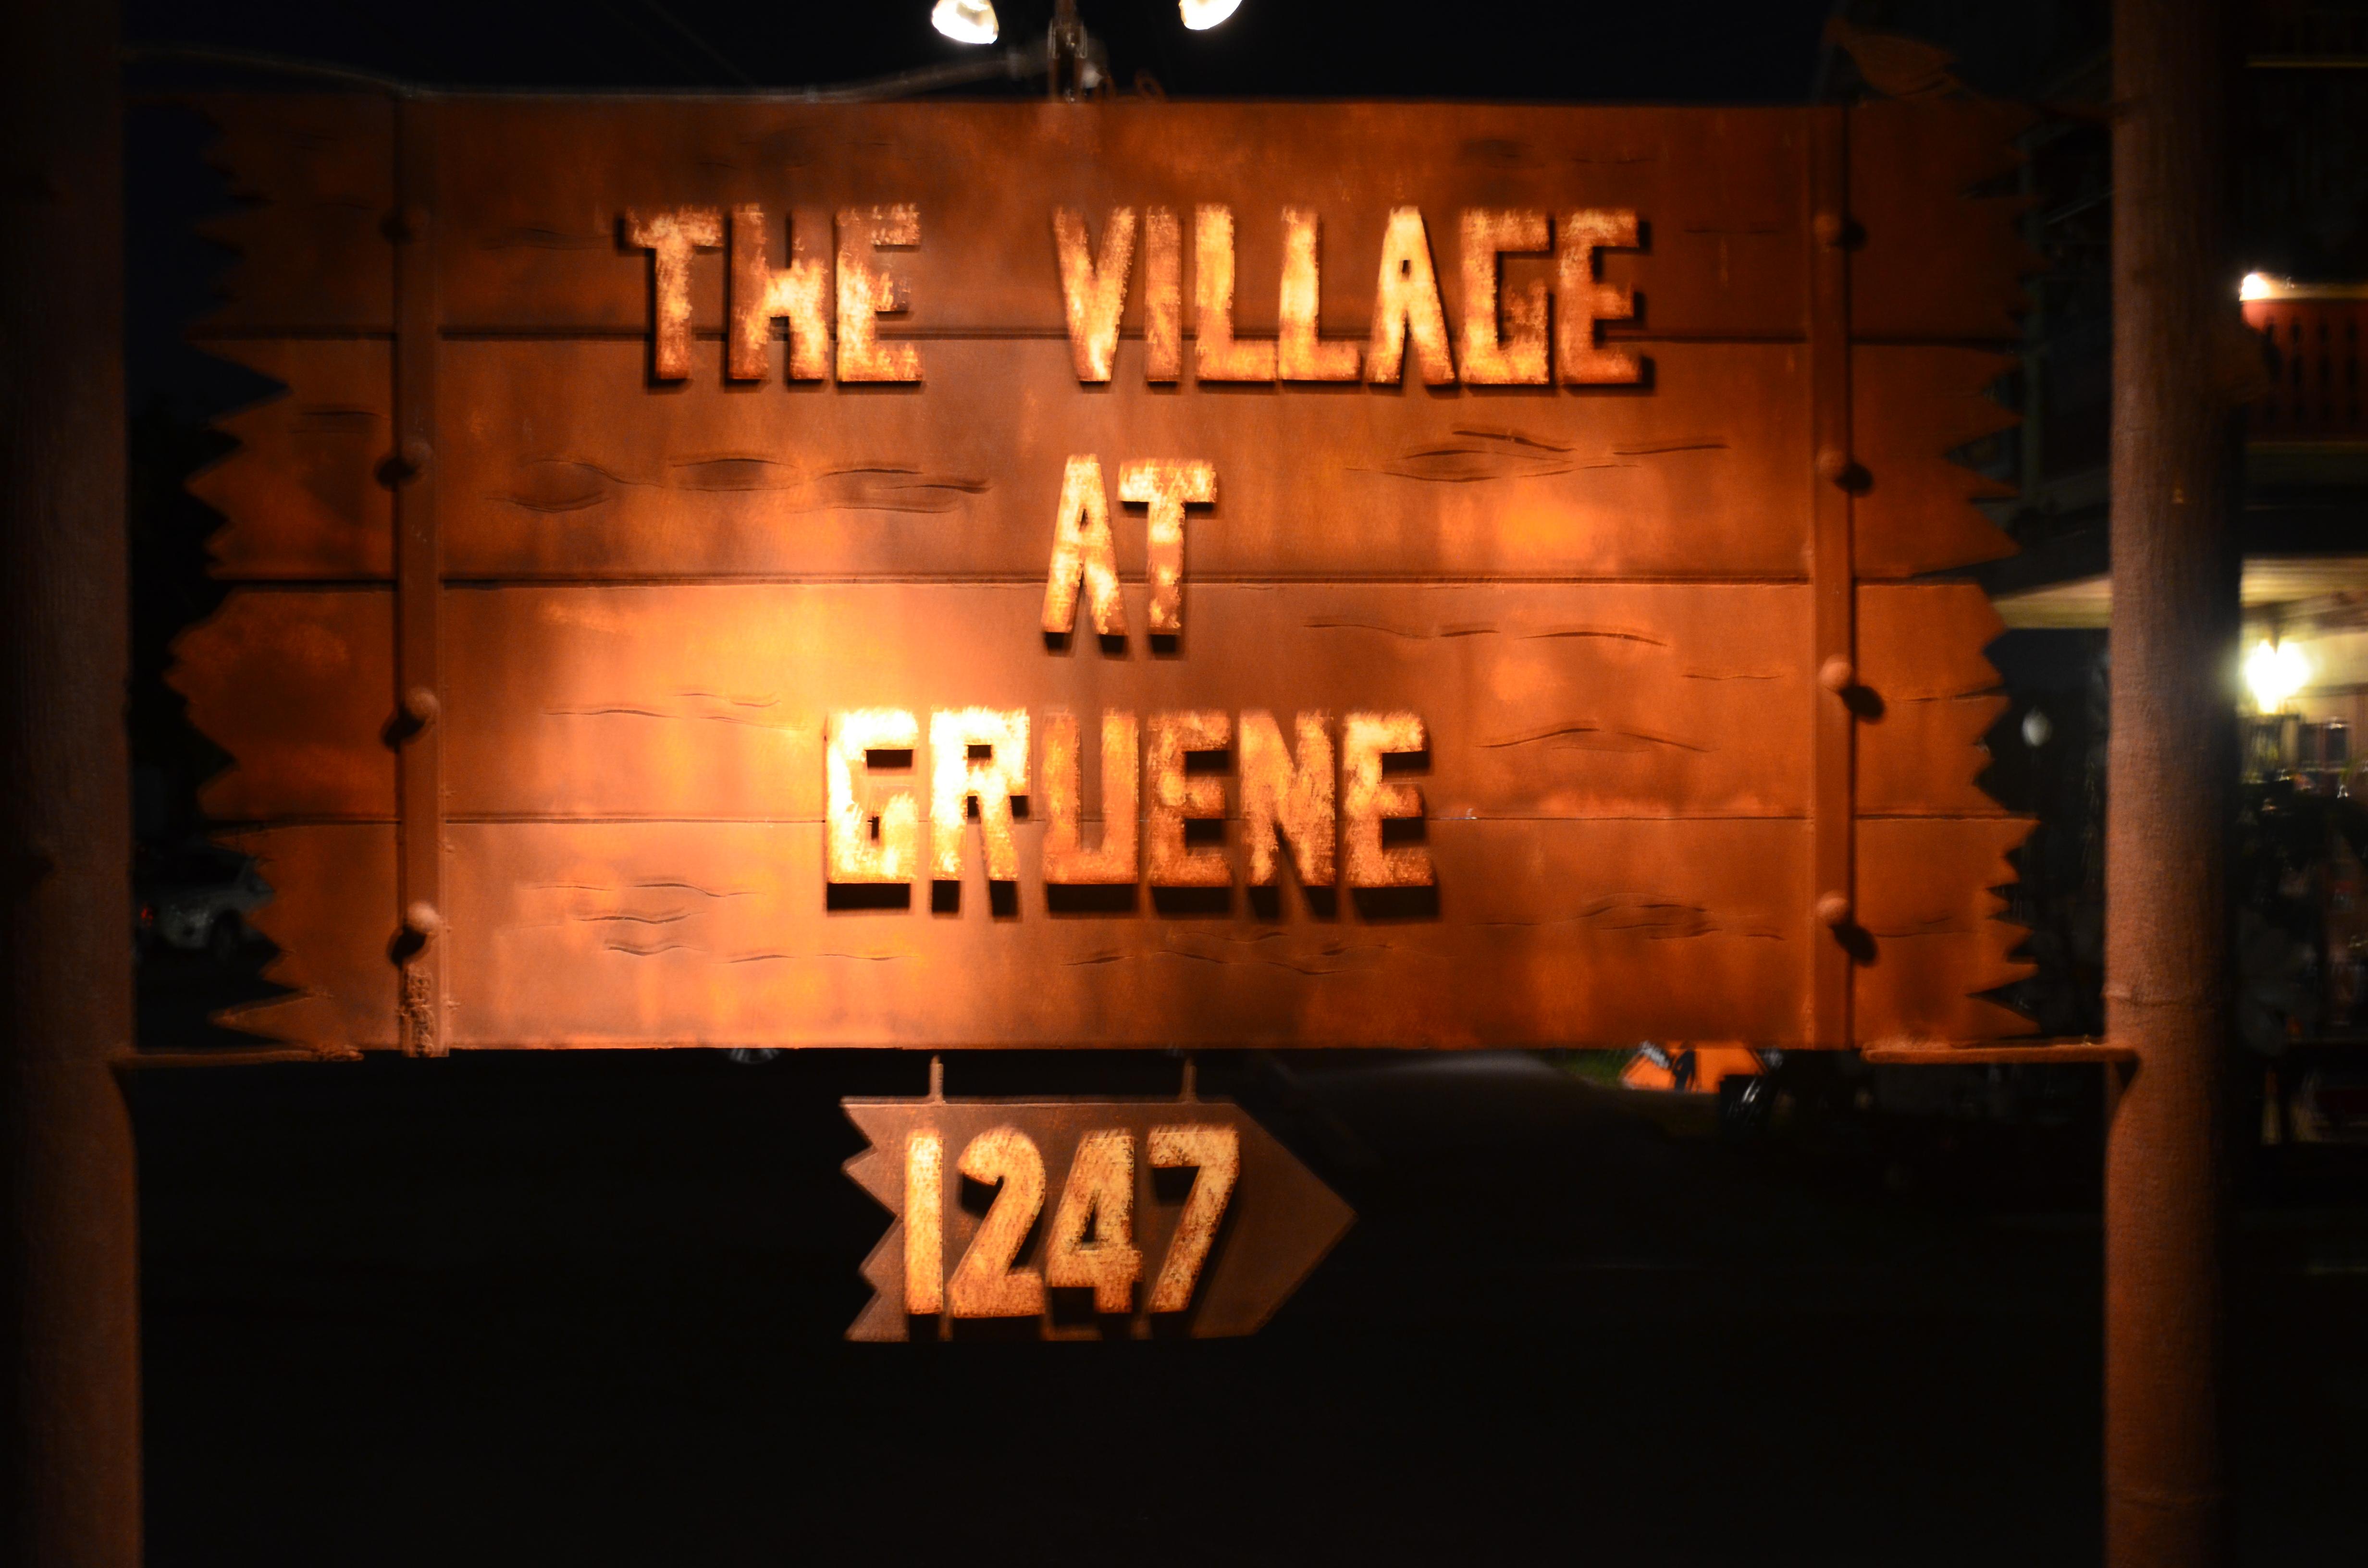 The Village at Gruene Condominiums.